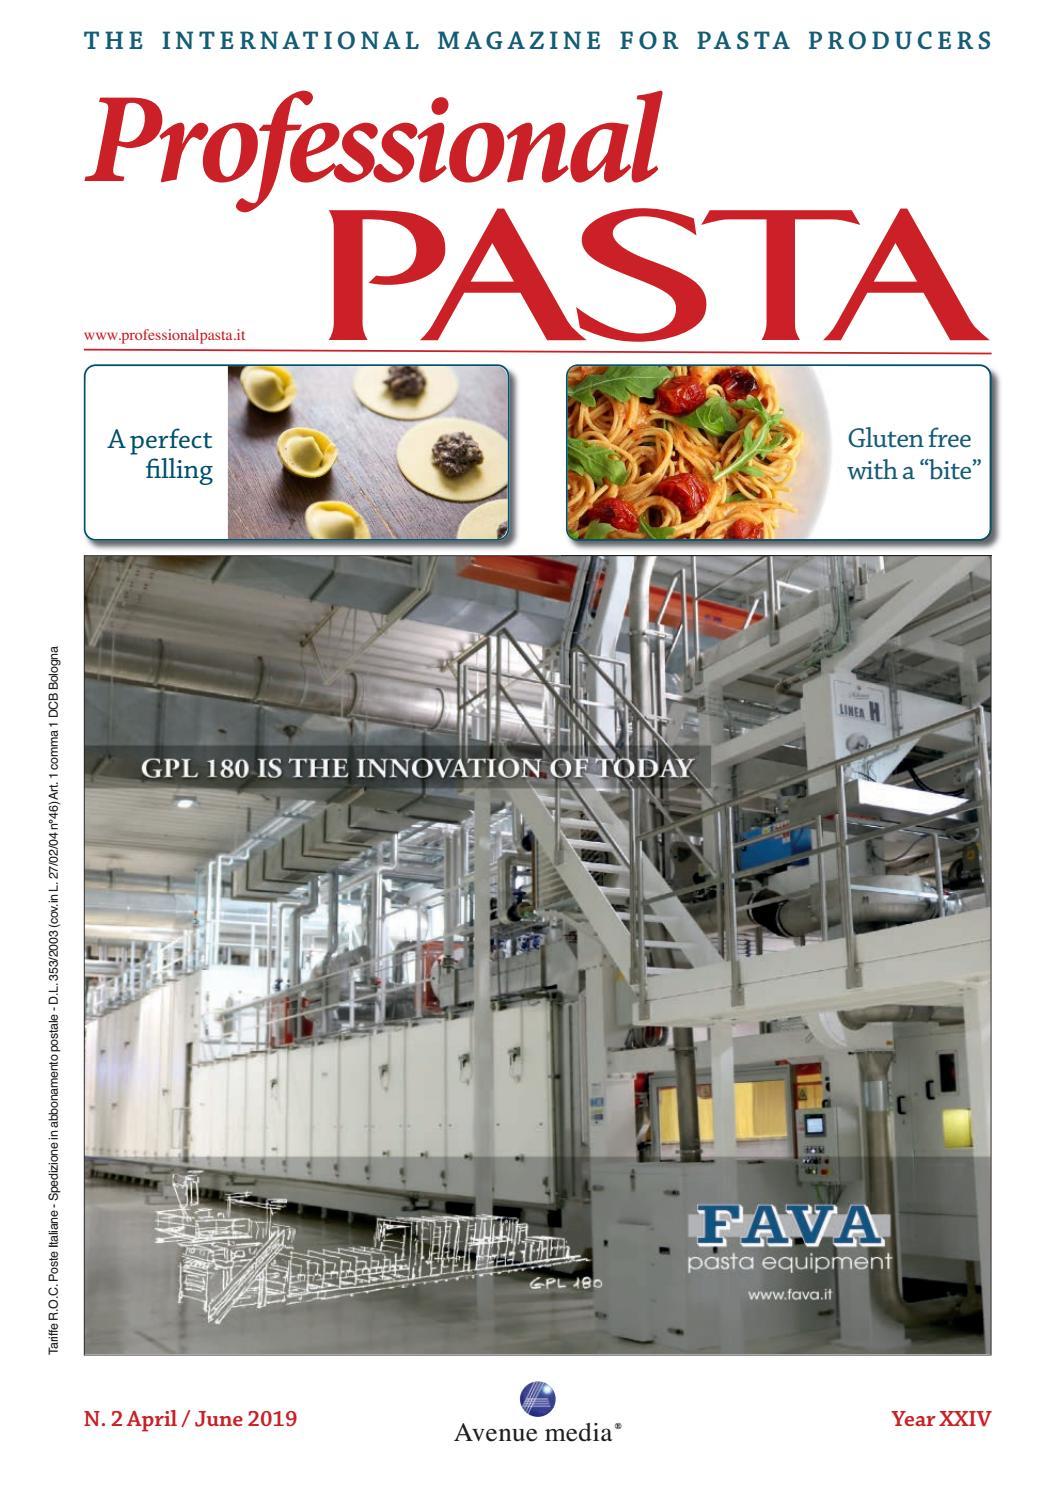 Professional Pasta N. 2 April/June 2019 by Avenue media - issuu